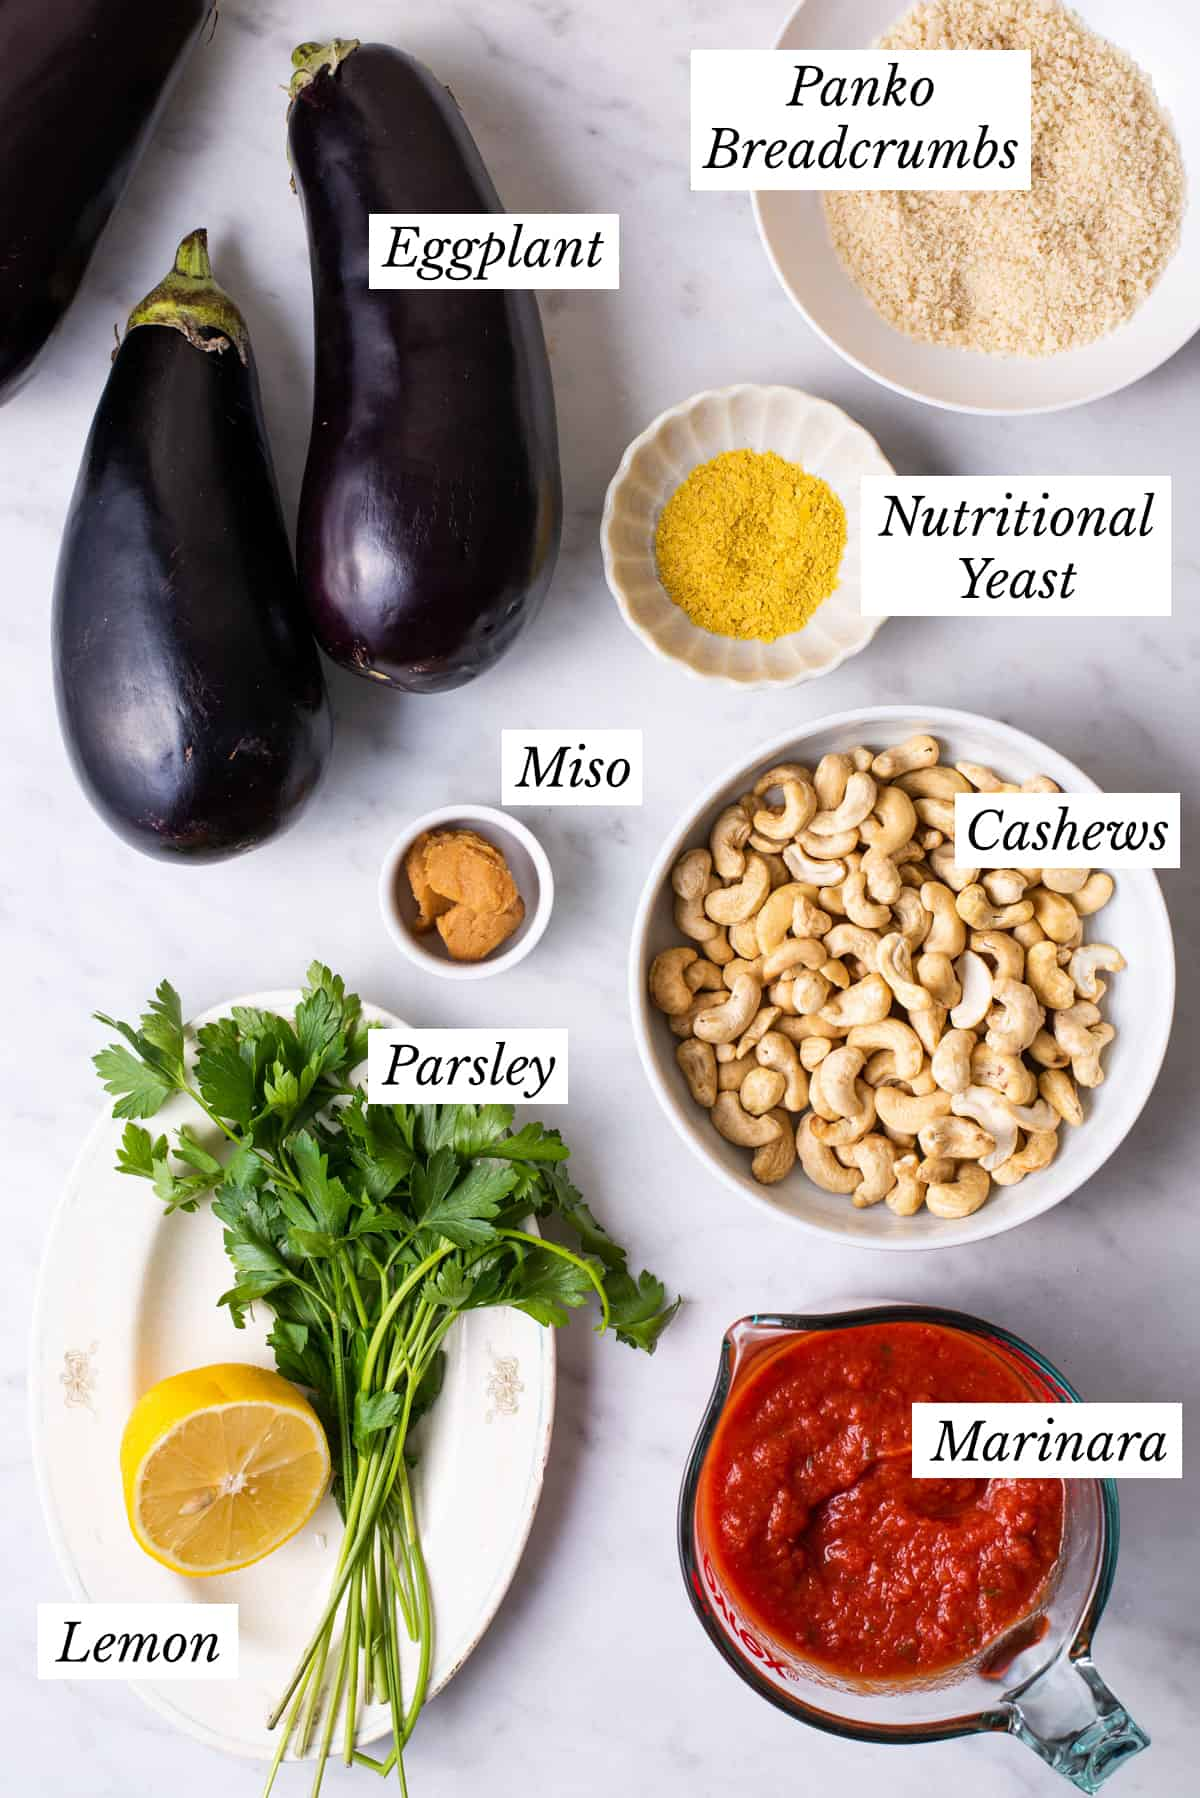 Ingredients gathered to make eggplant lasagna stacks.